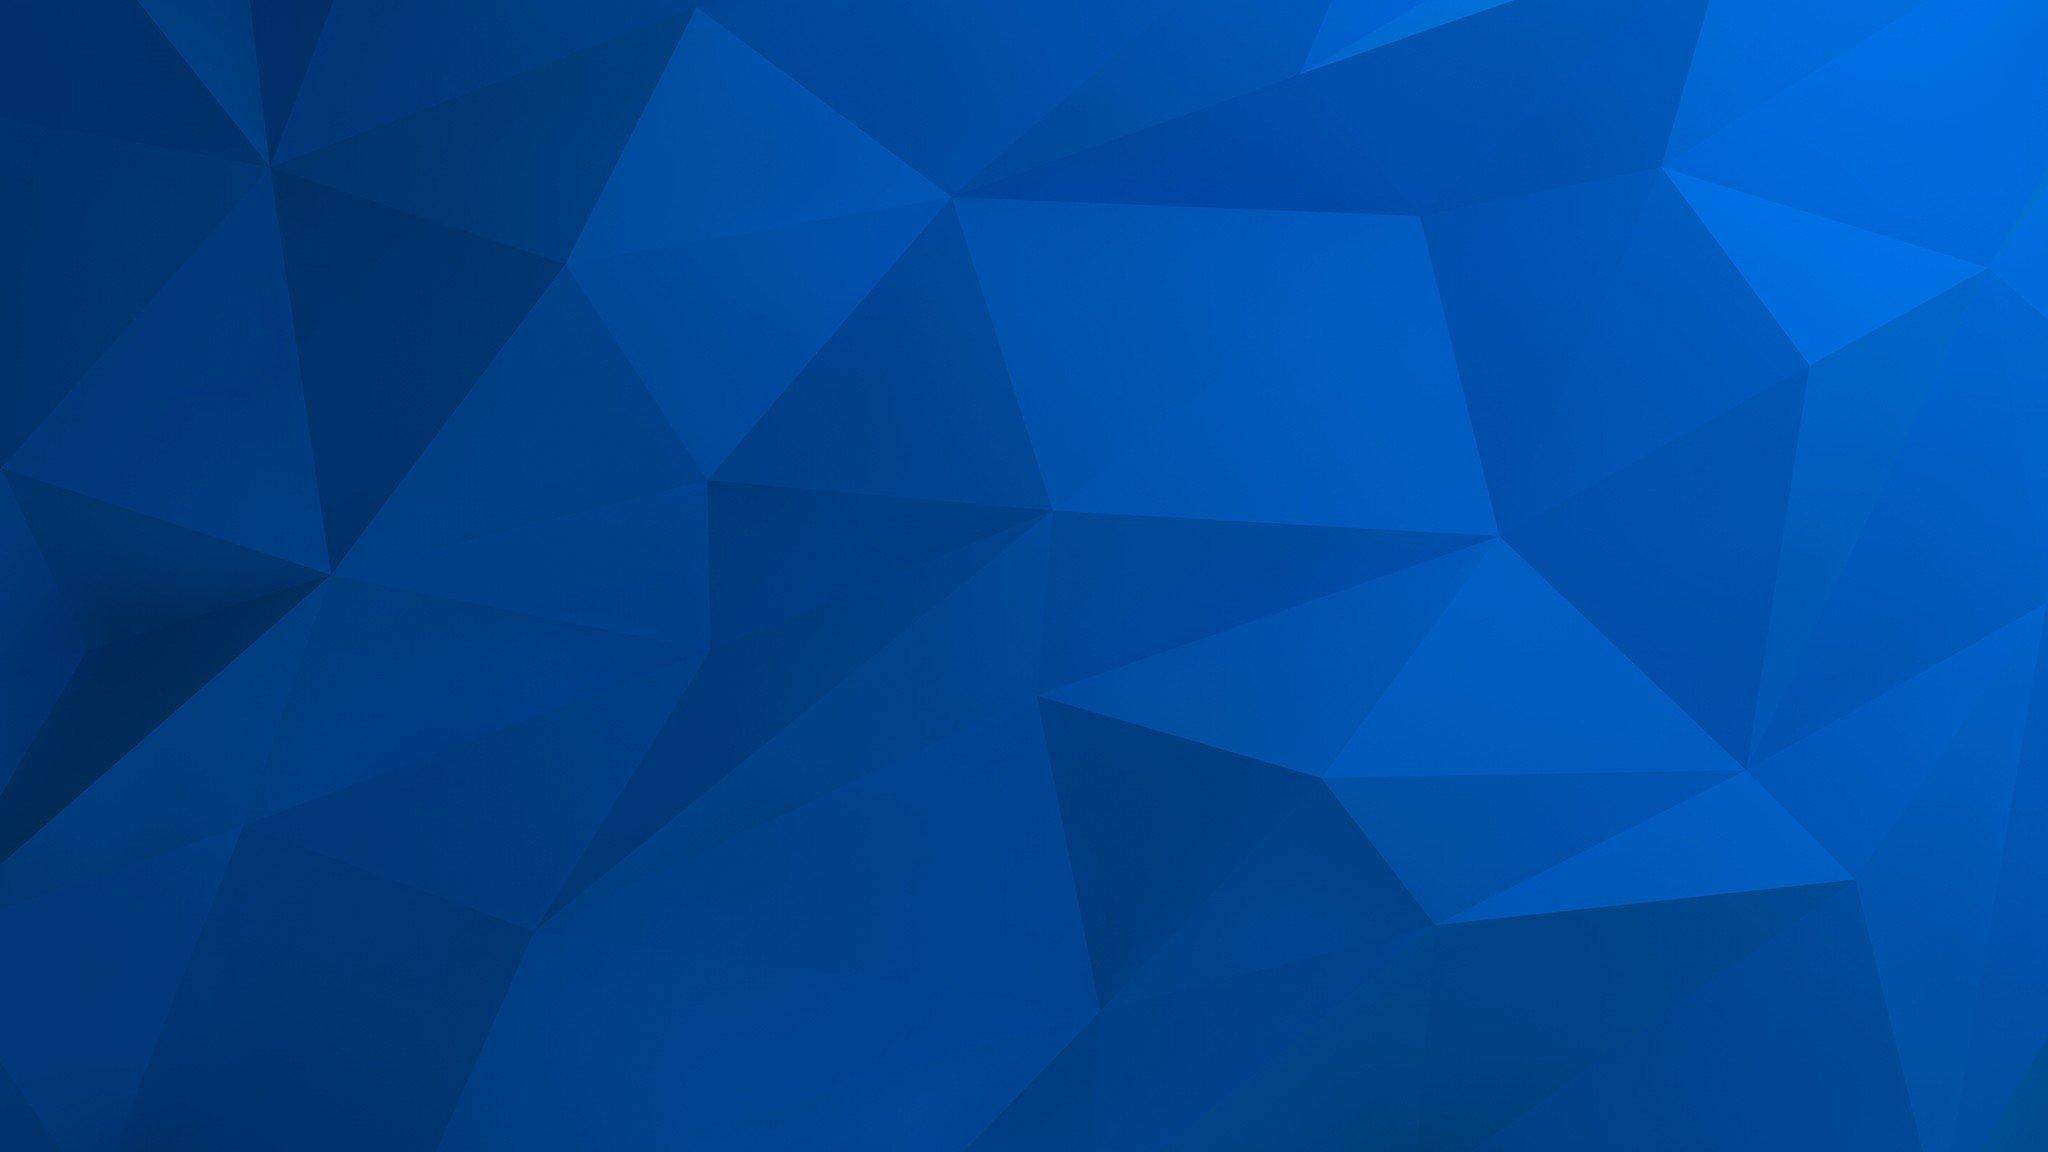 Fond D Ecran 2048x1152 Px Bleu Simple 2048x1152 Coolwallpapers 1200388 Fond D Ecran Wallhere